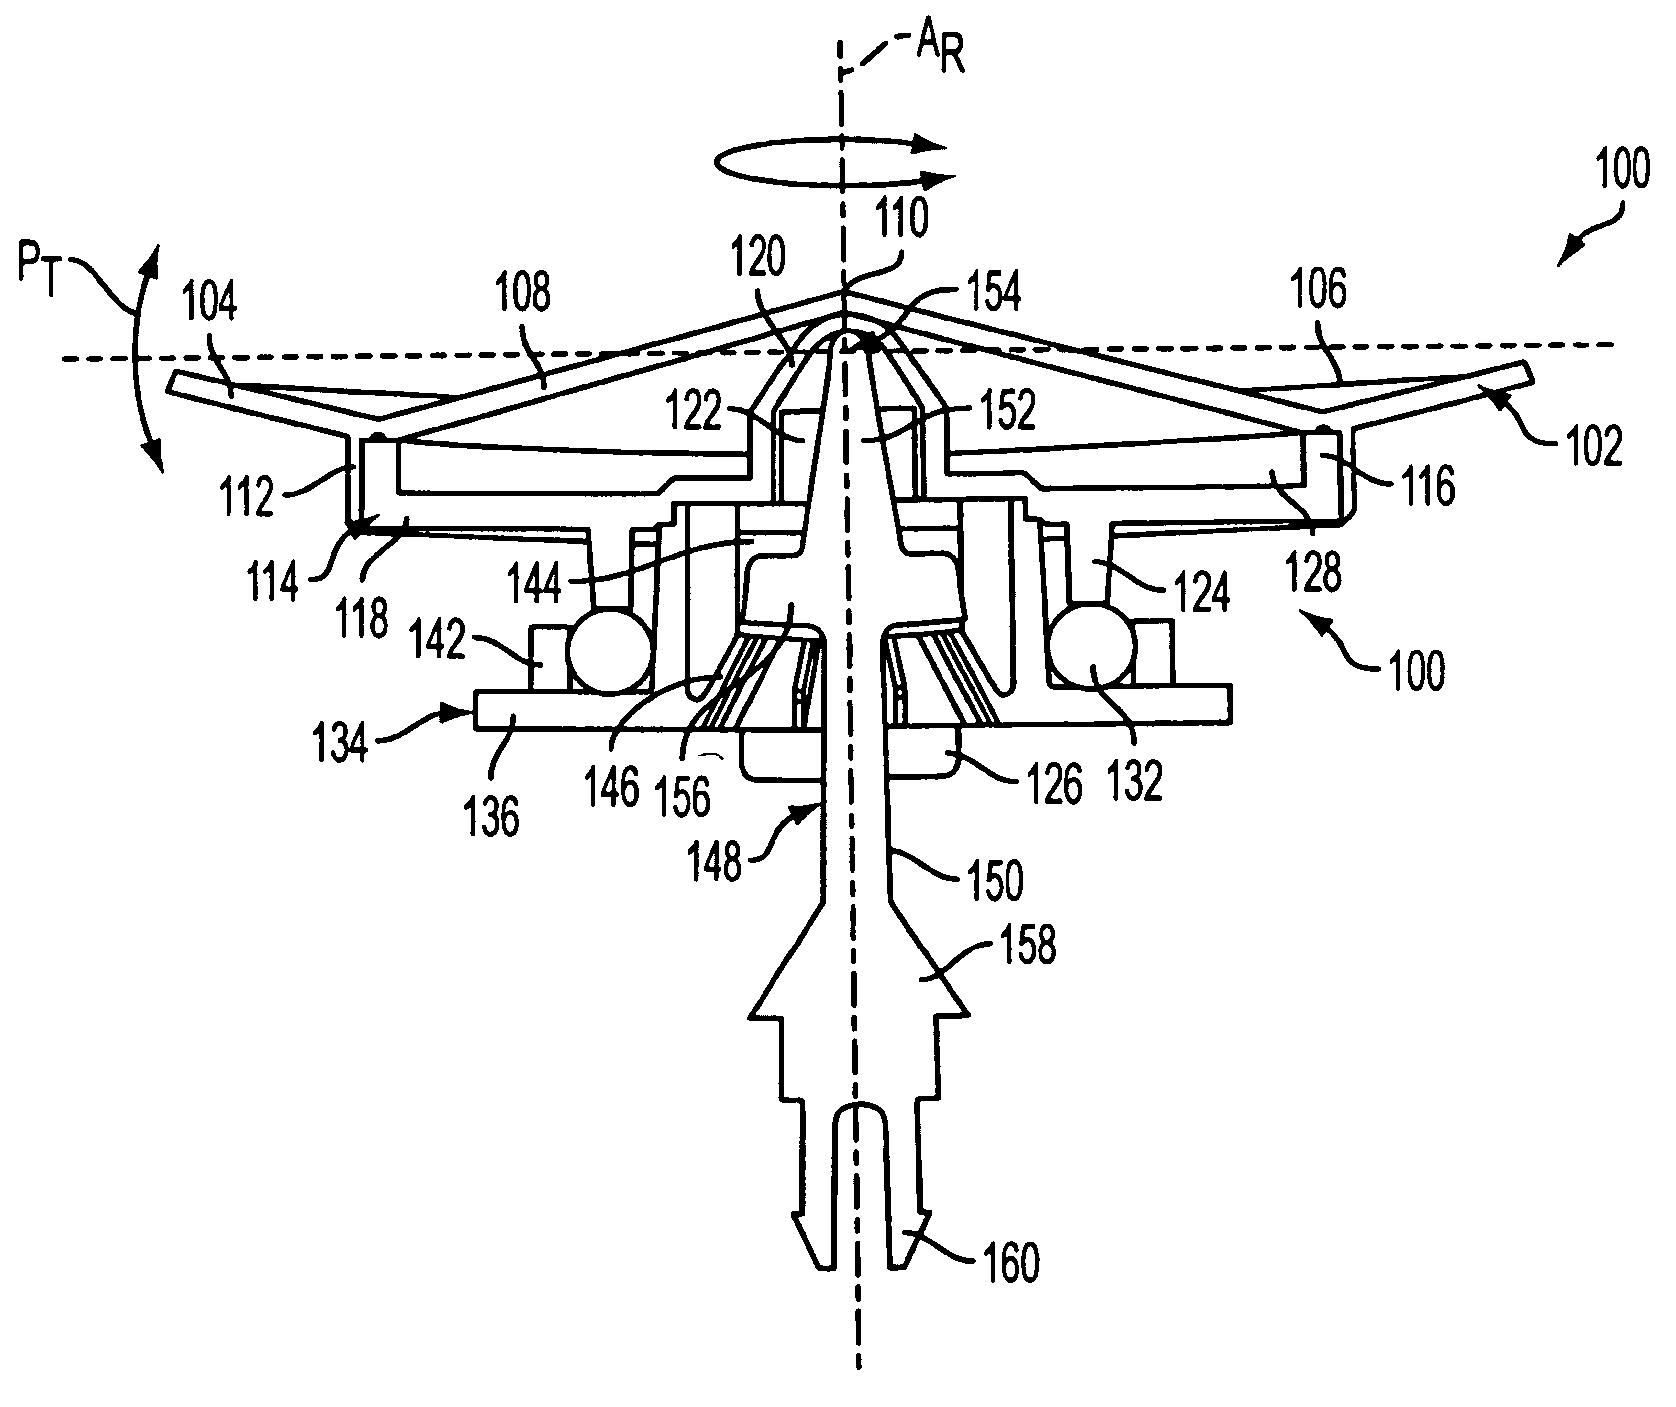 2001 yamaha grizzly 600 wiring diagram rv ac plug engine imageresizertool com